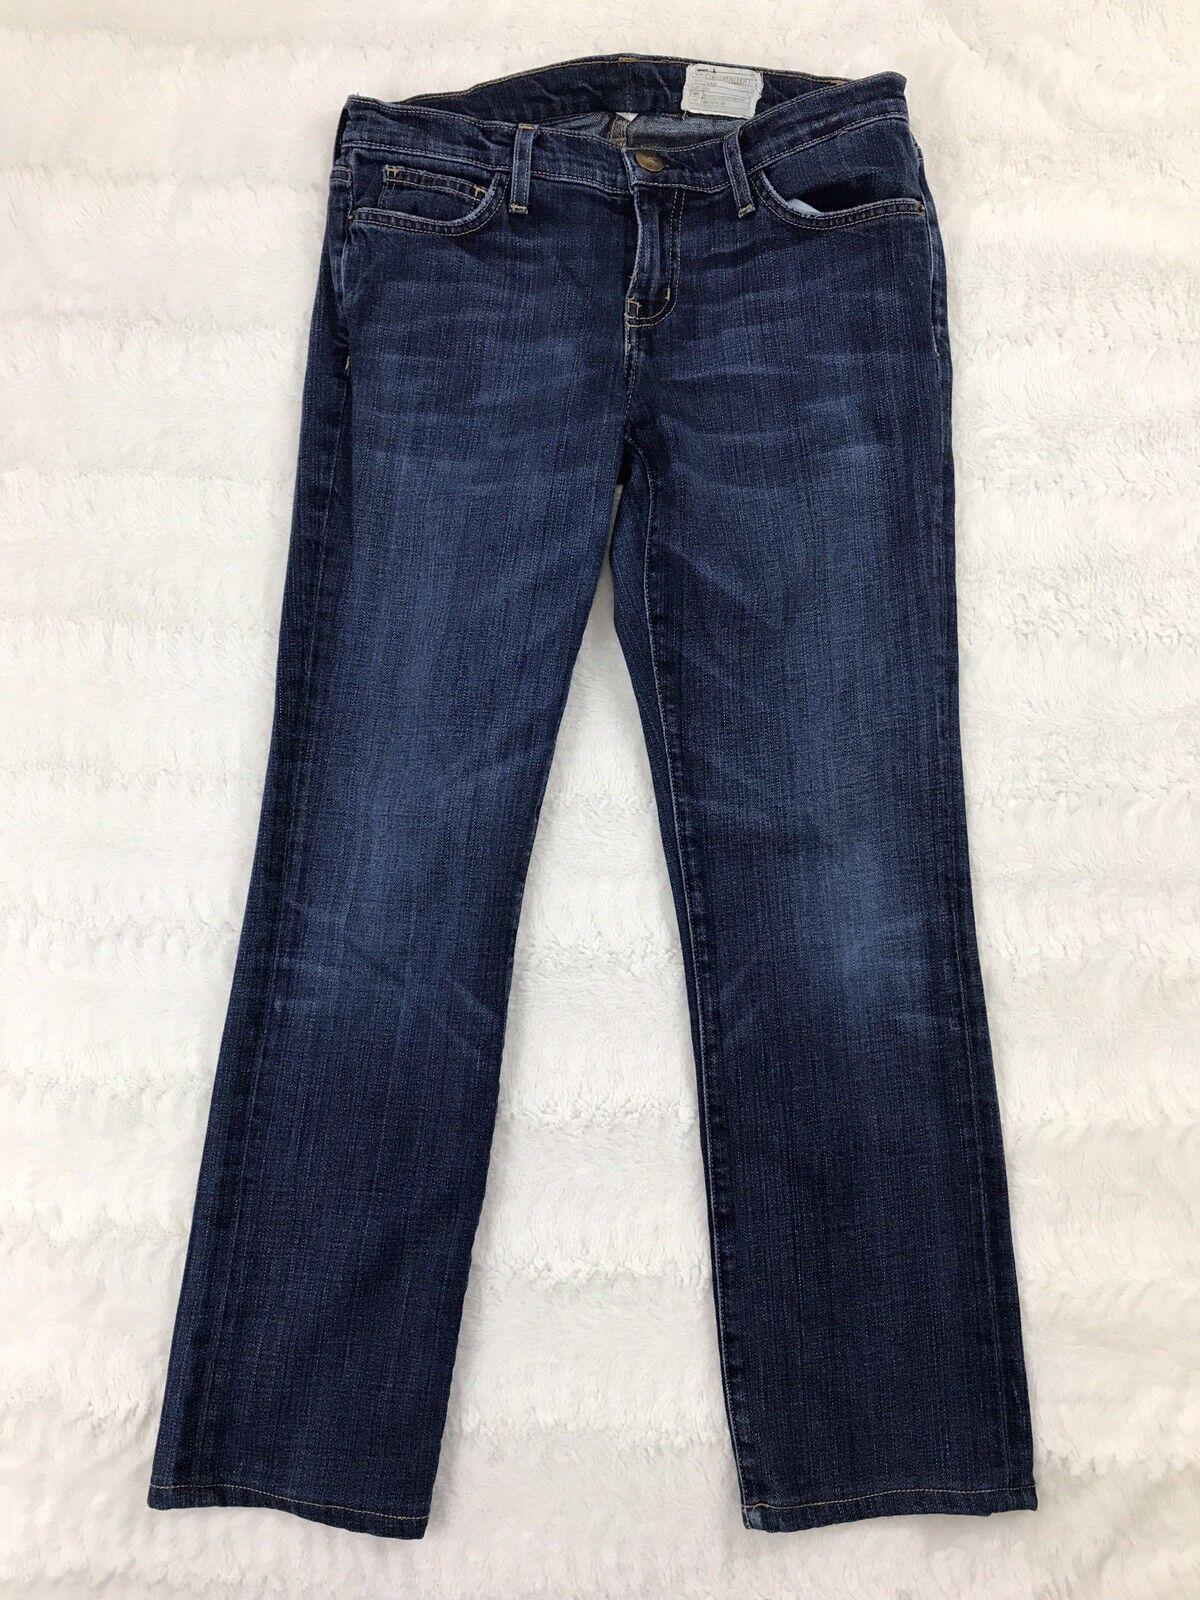 Current Elliott Womens Jeans Size 29 The Straight Leg Rambler Dark Wash